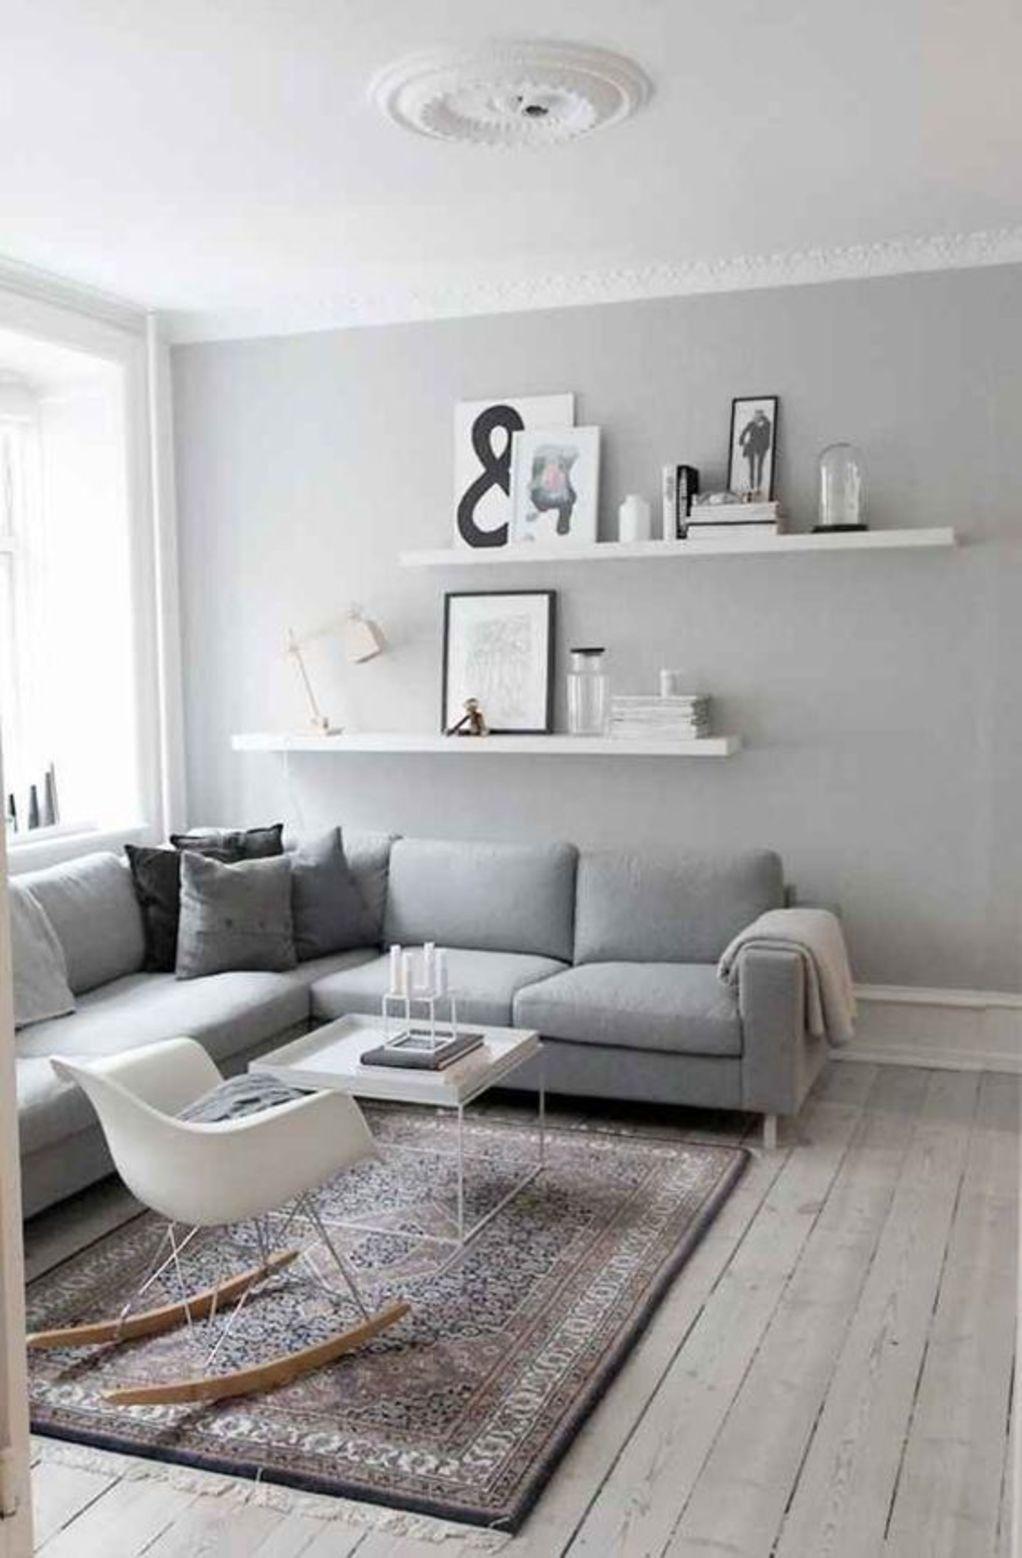 Minimal Interior Design Inspiration 41 Ultralinx Dream Land  # Muebles Jimenez Baza